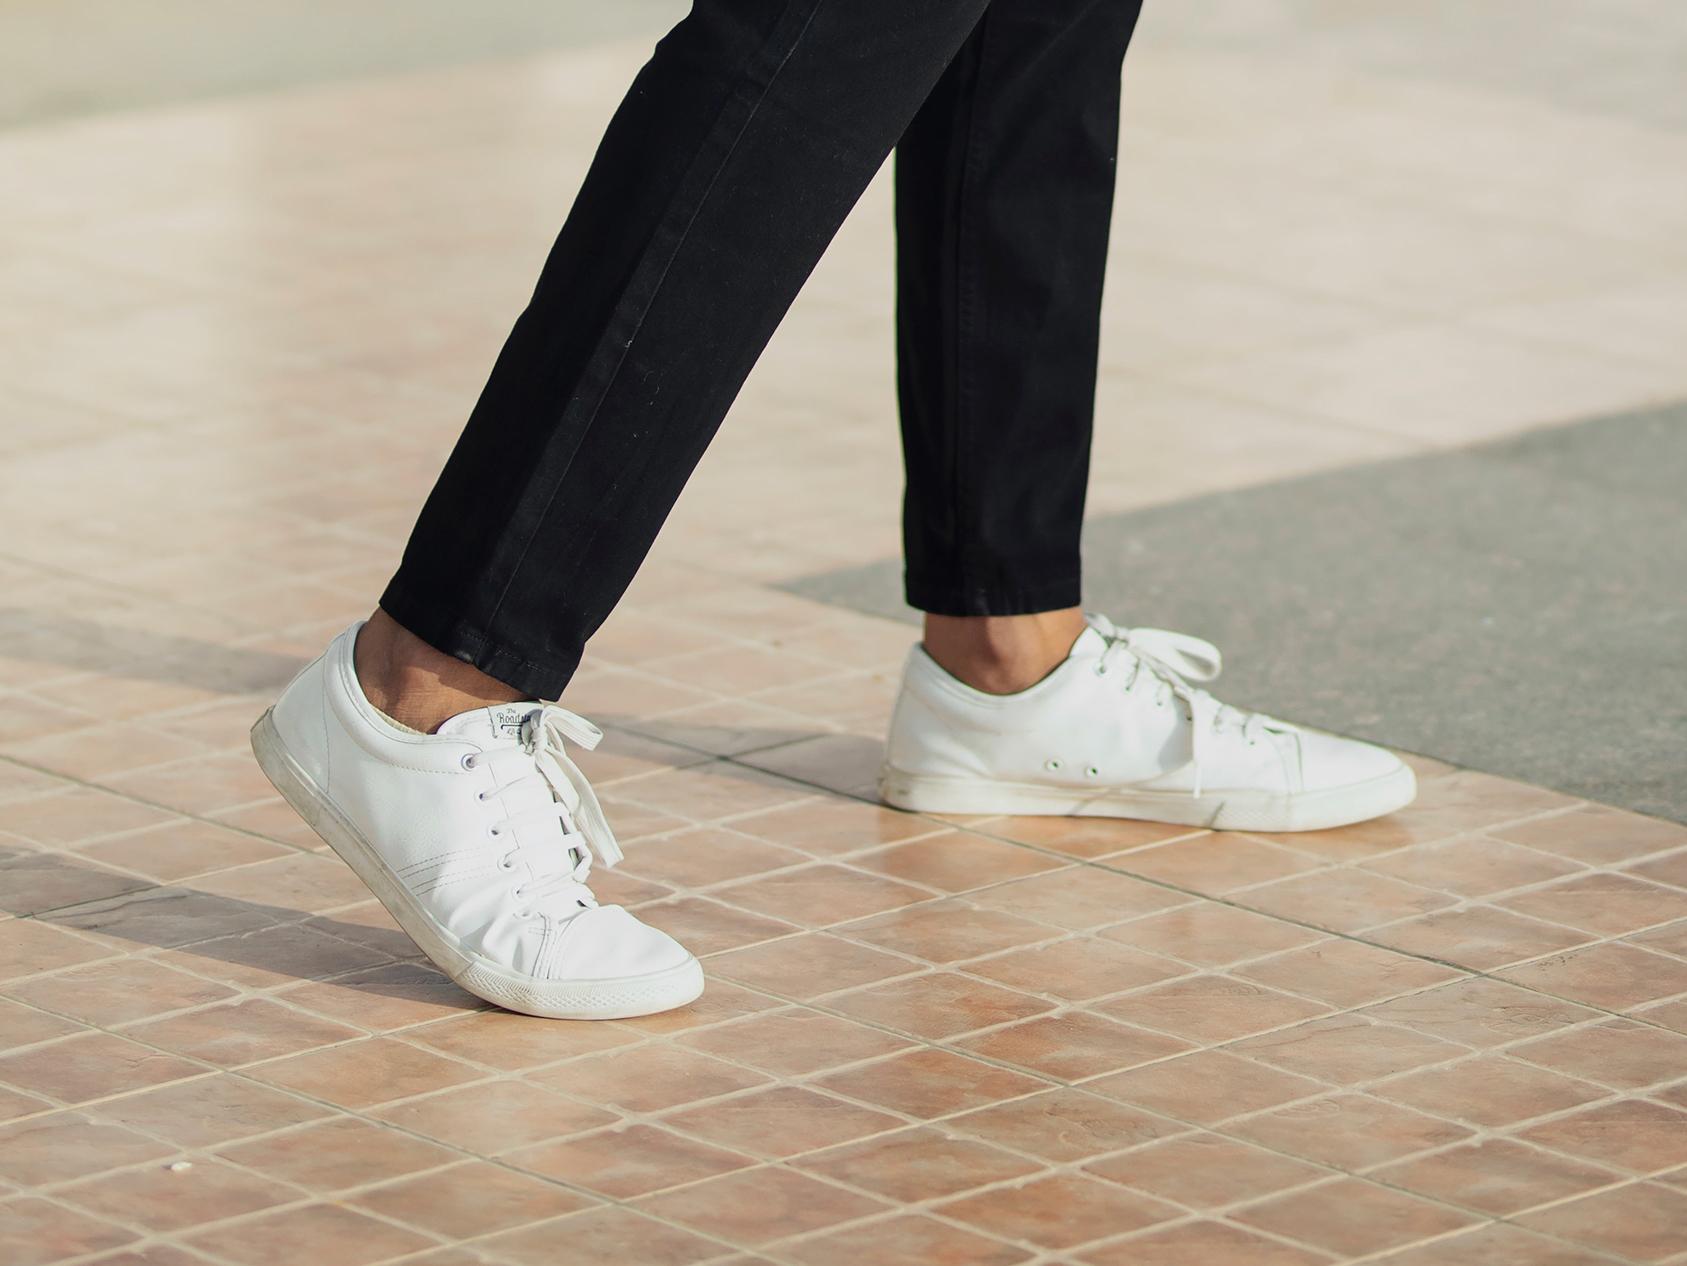 Casual Men's Shoes That Aren't Sneakers